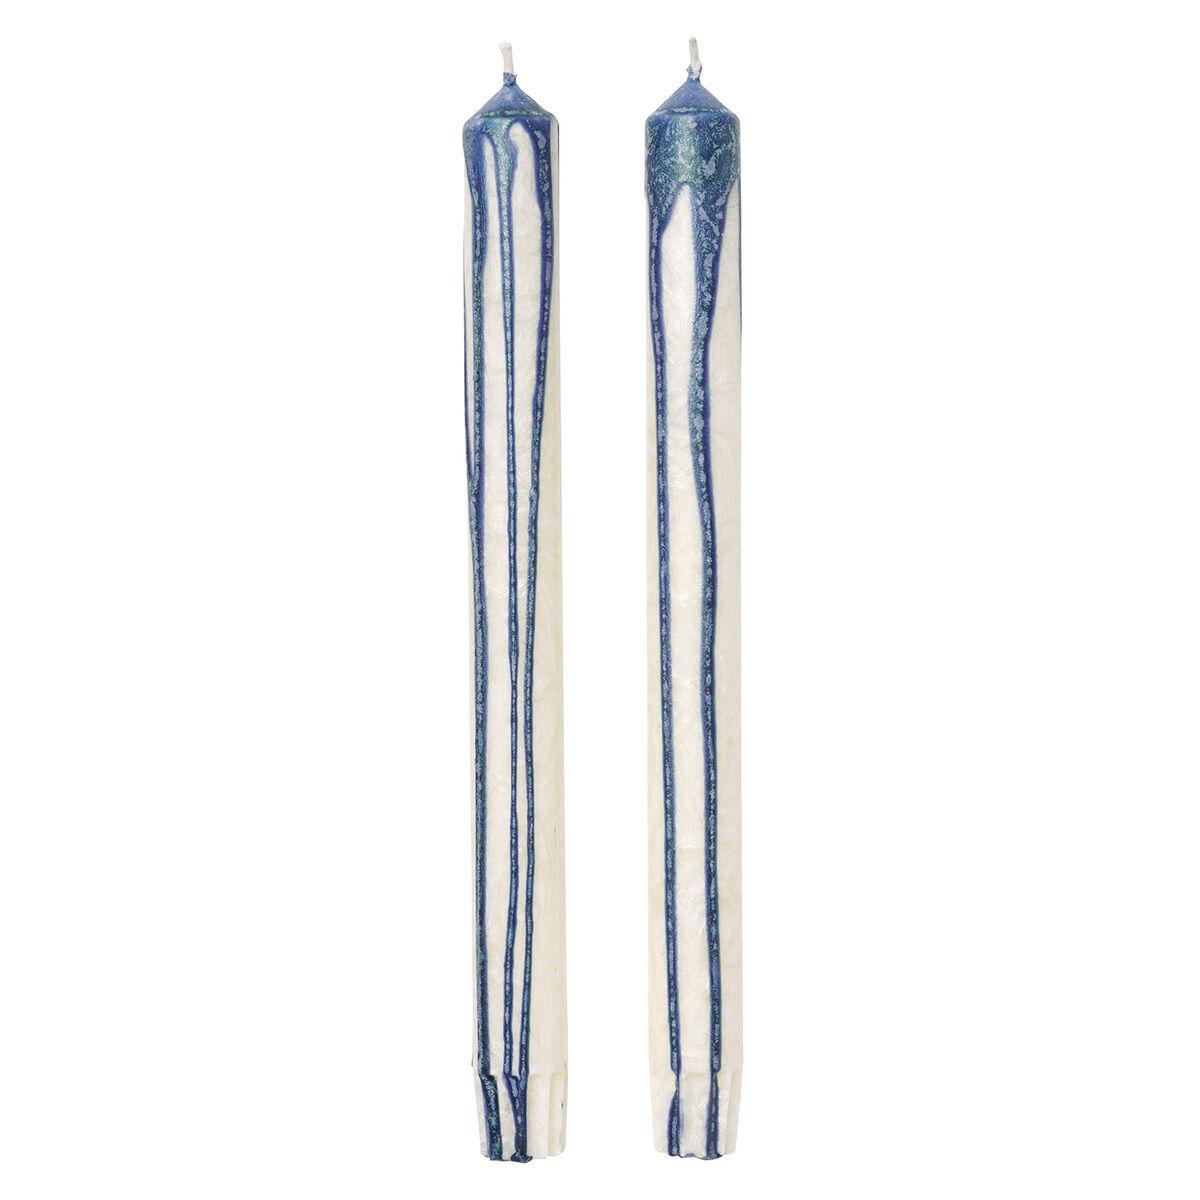 Ferm Living Duo kynttilä, 2 kpl, tummansininen